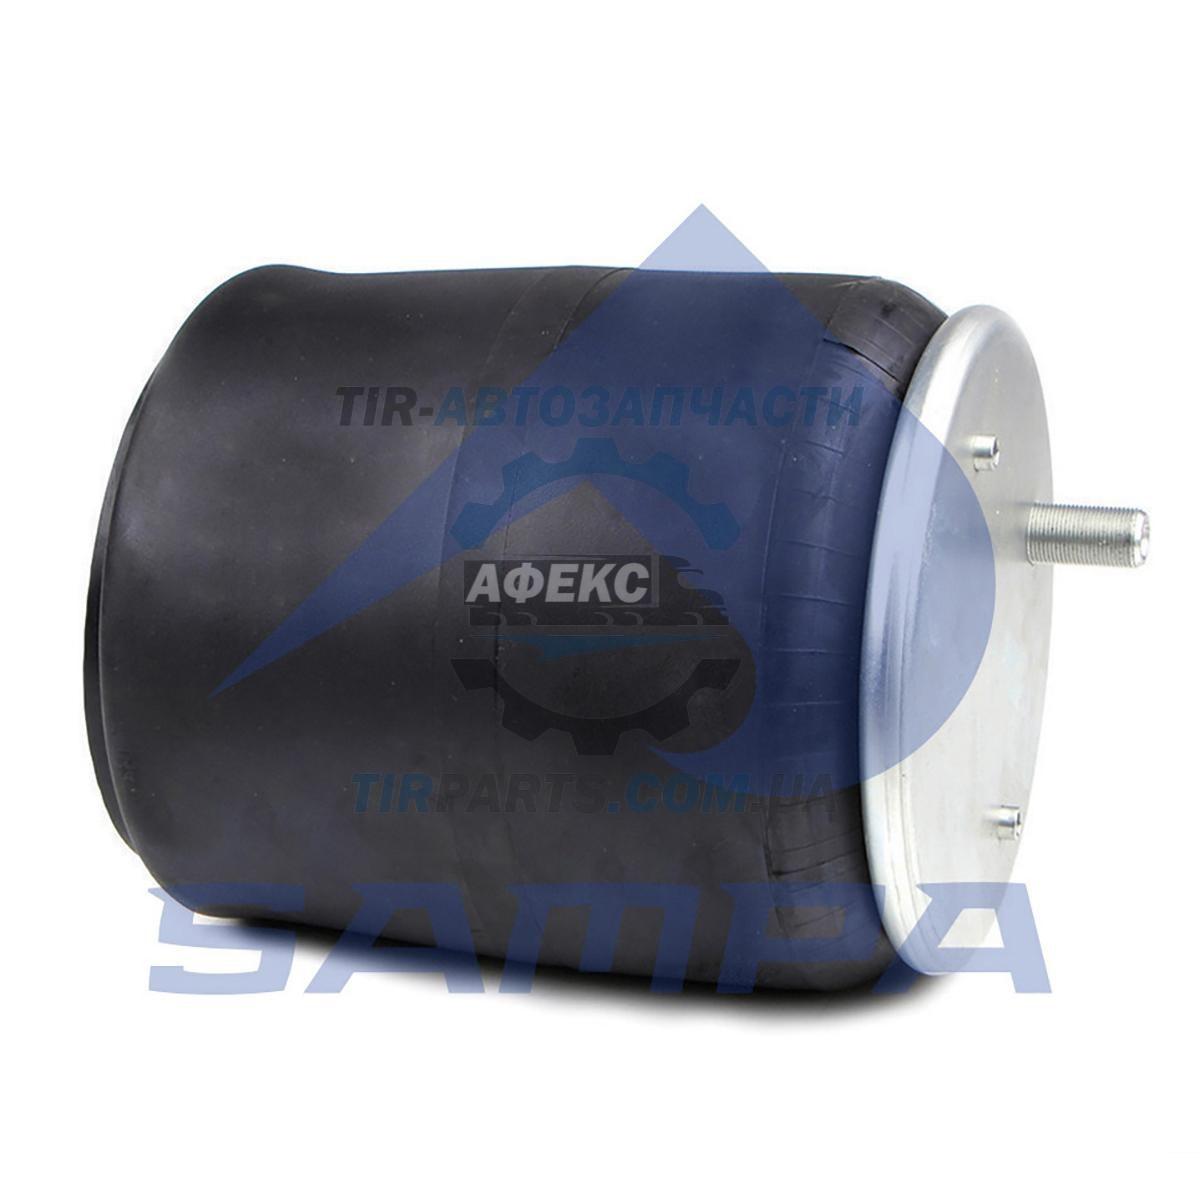 Пневмоподушка с пластиковым cтаканом SCHMITZ 2 шпильки-воздух W01M586318, US06318F (016512 | SP 556318-KP)